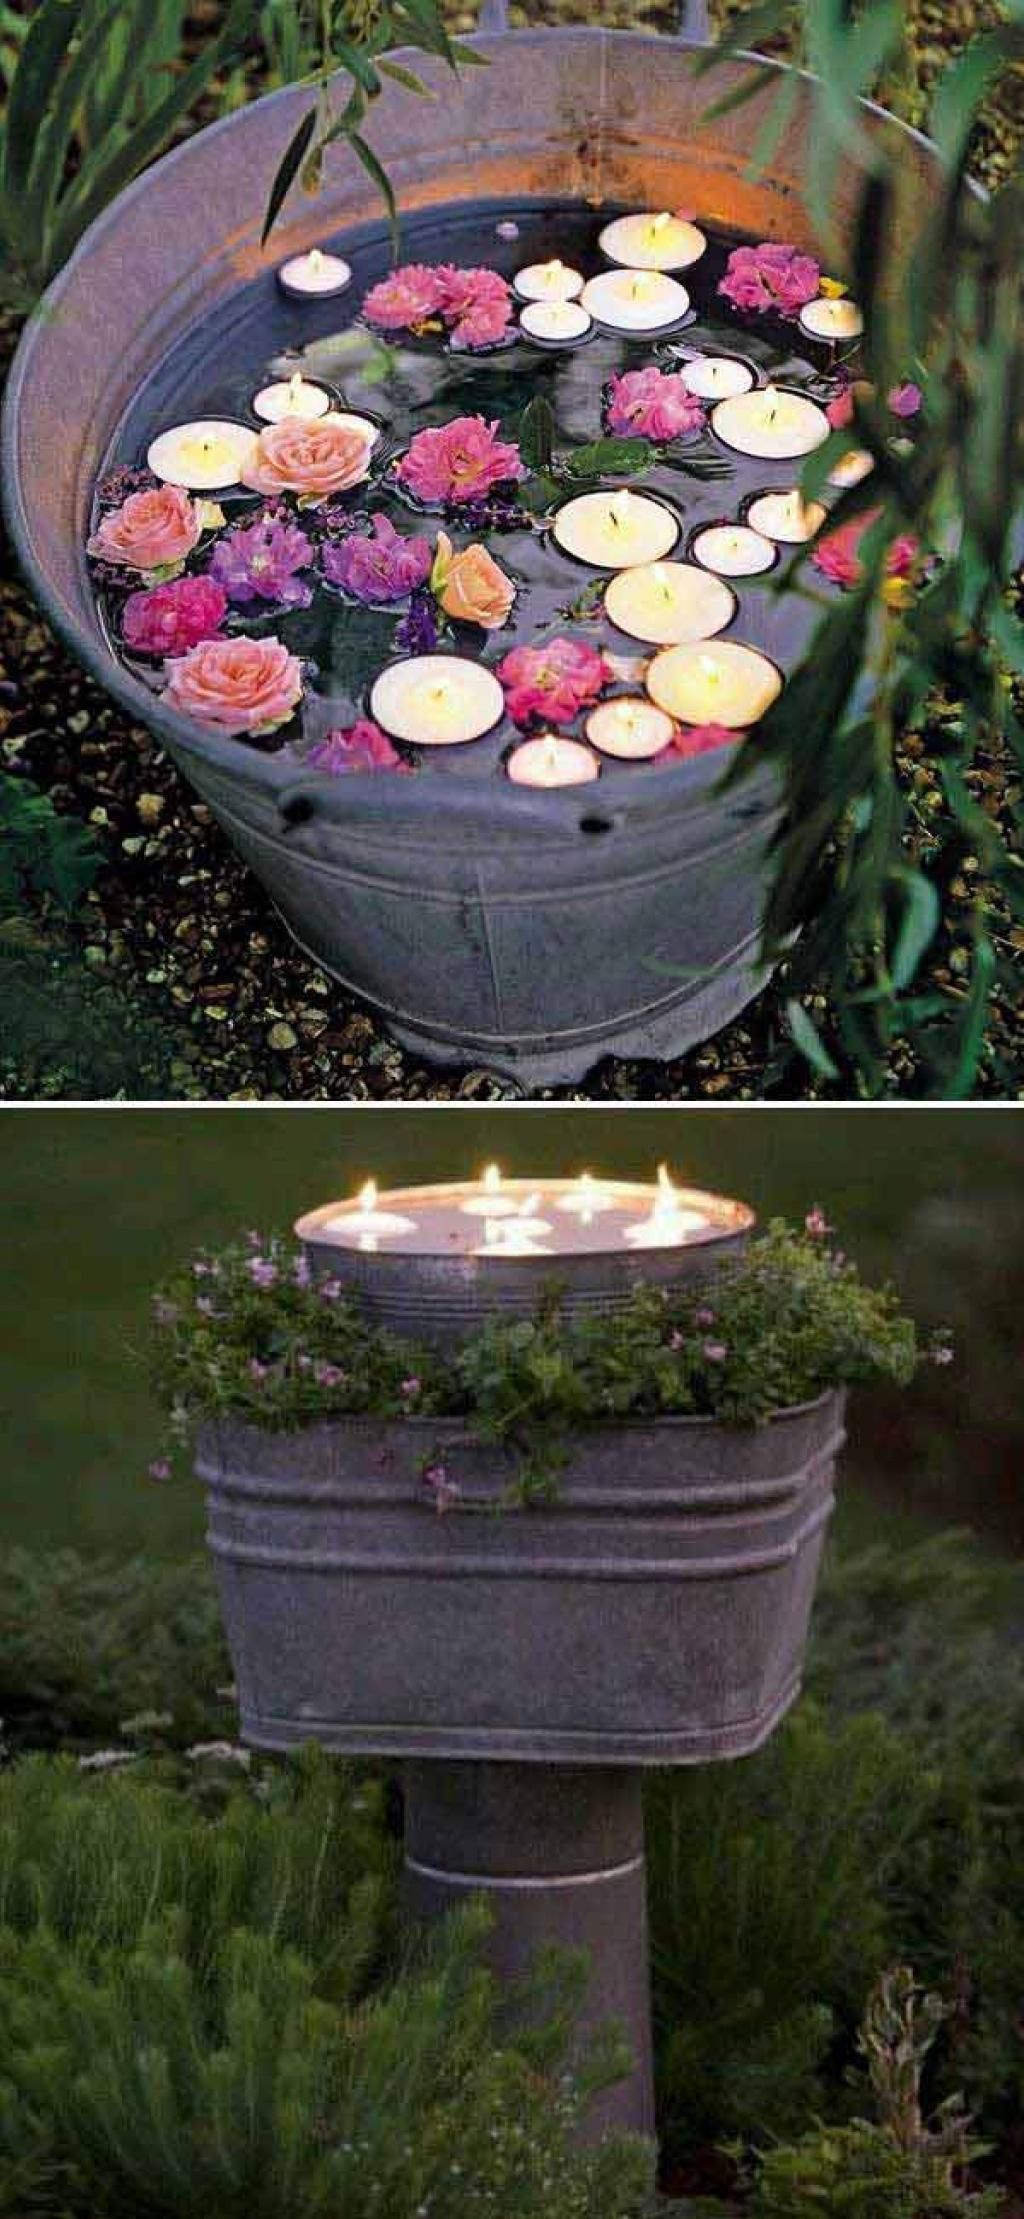 20 splendid ways to light up your garden at night ...